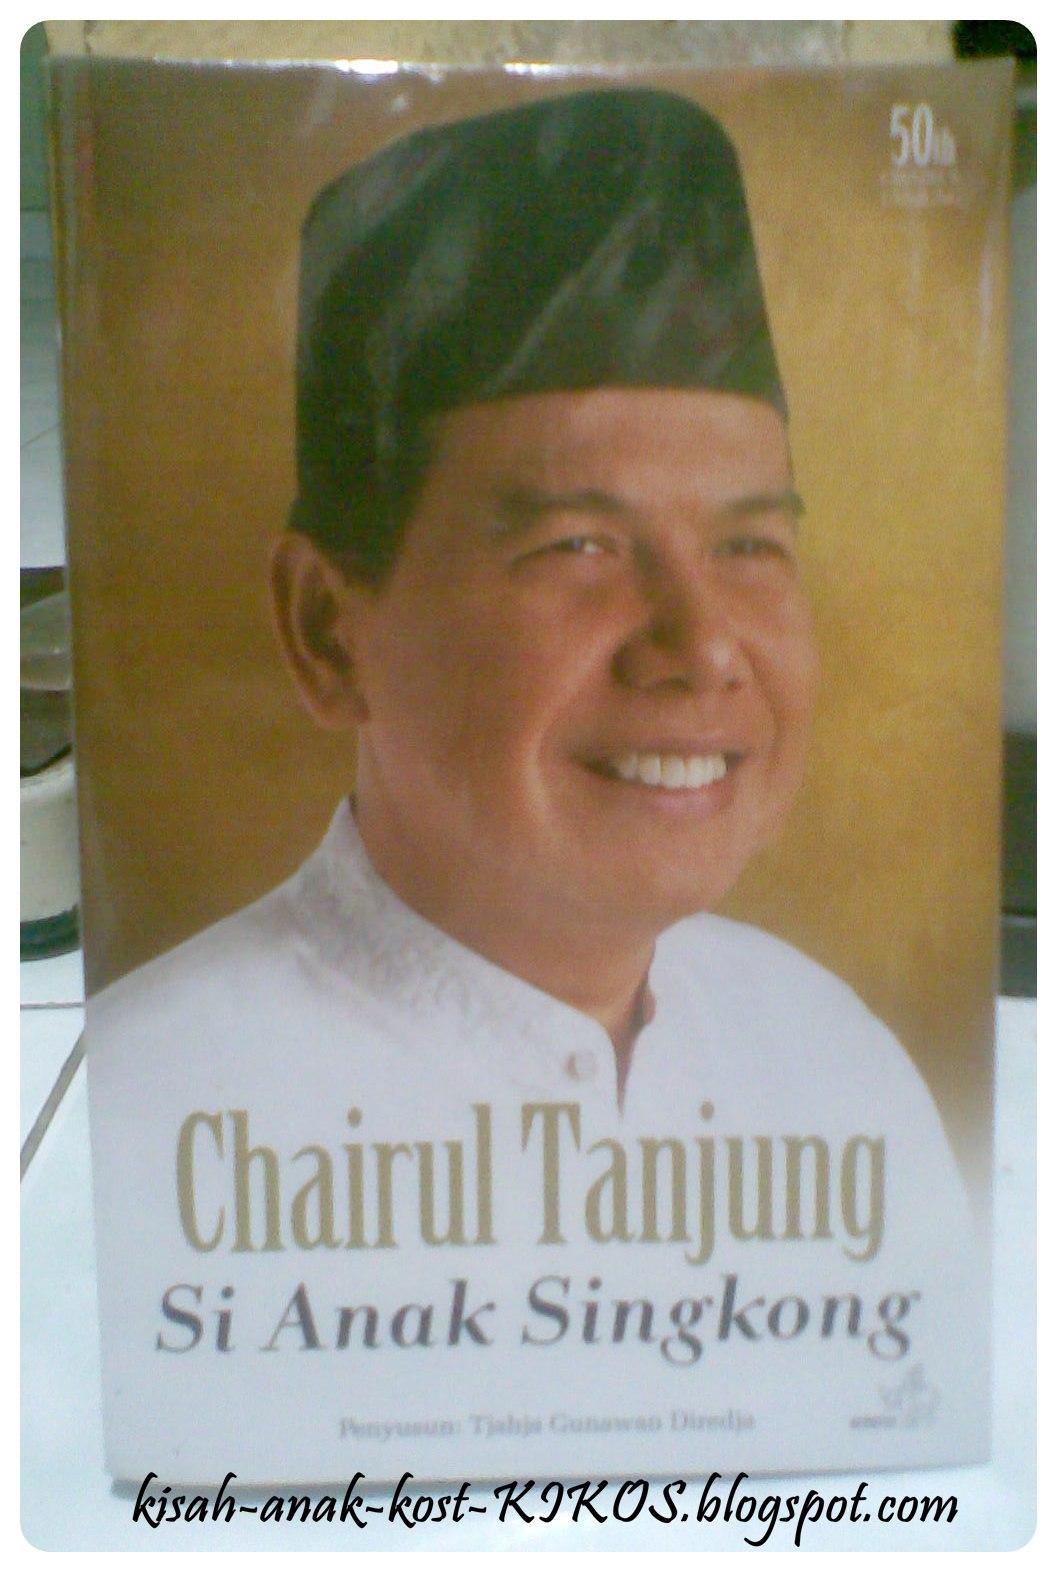 Chairul Tanjung Office Chair Mesh Back Kisah Anak Kost Kikos Si Singkong